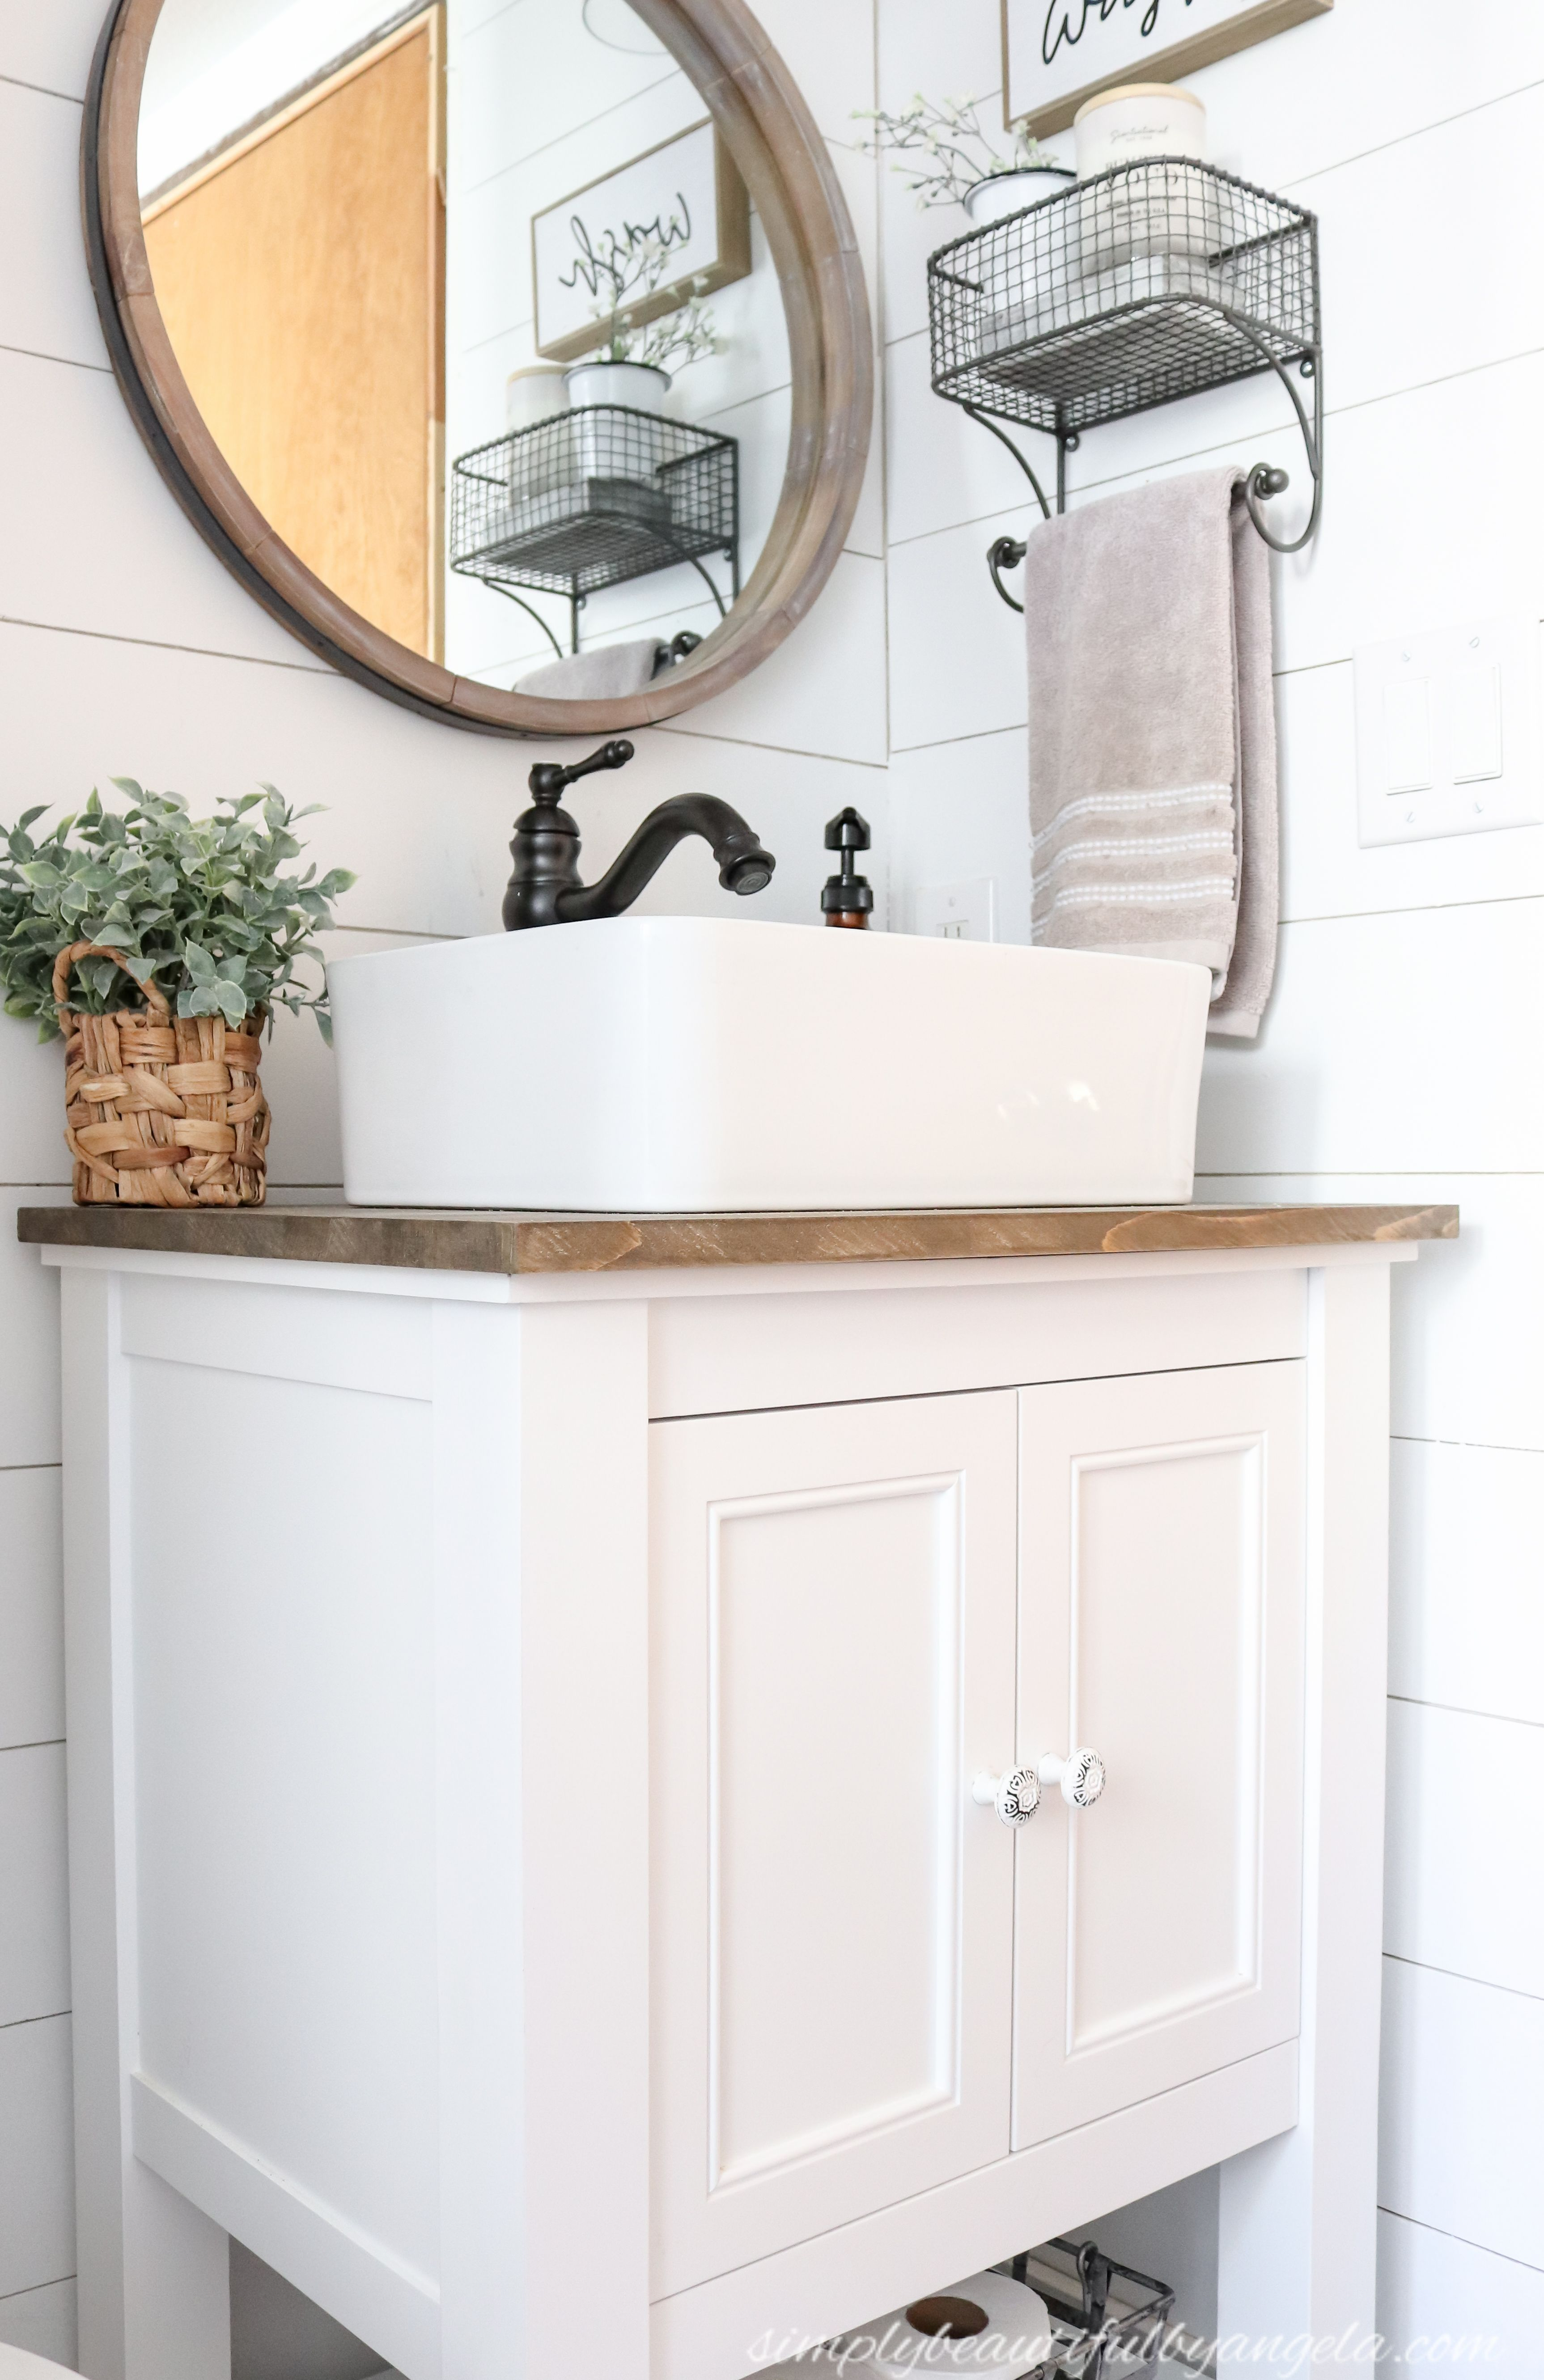 How to Install a Vanity & Vessel Sink Combo | Vanity sink ...